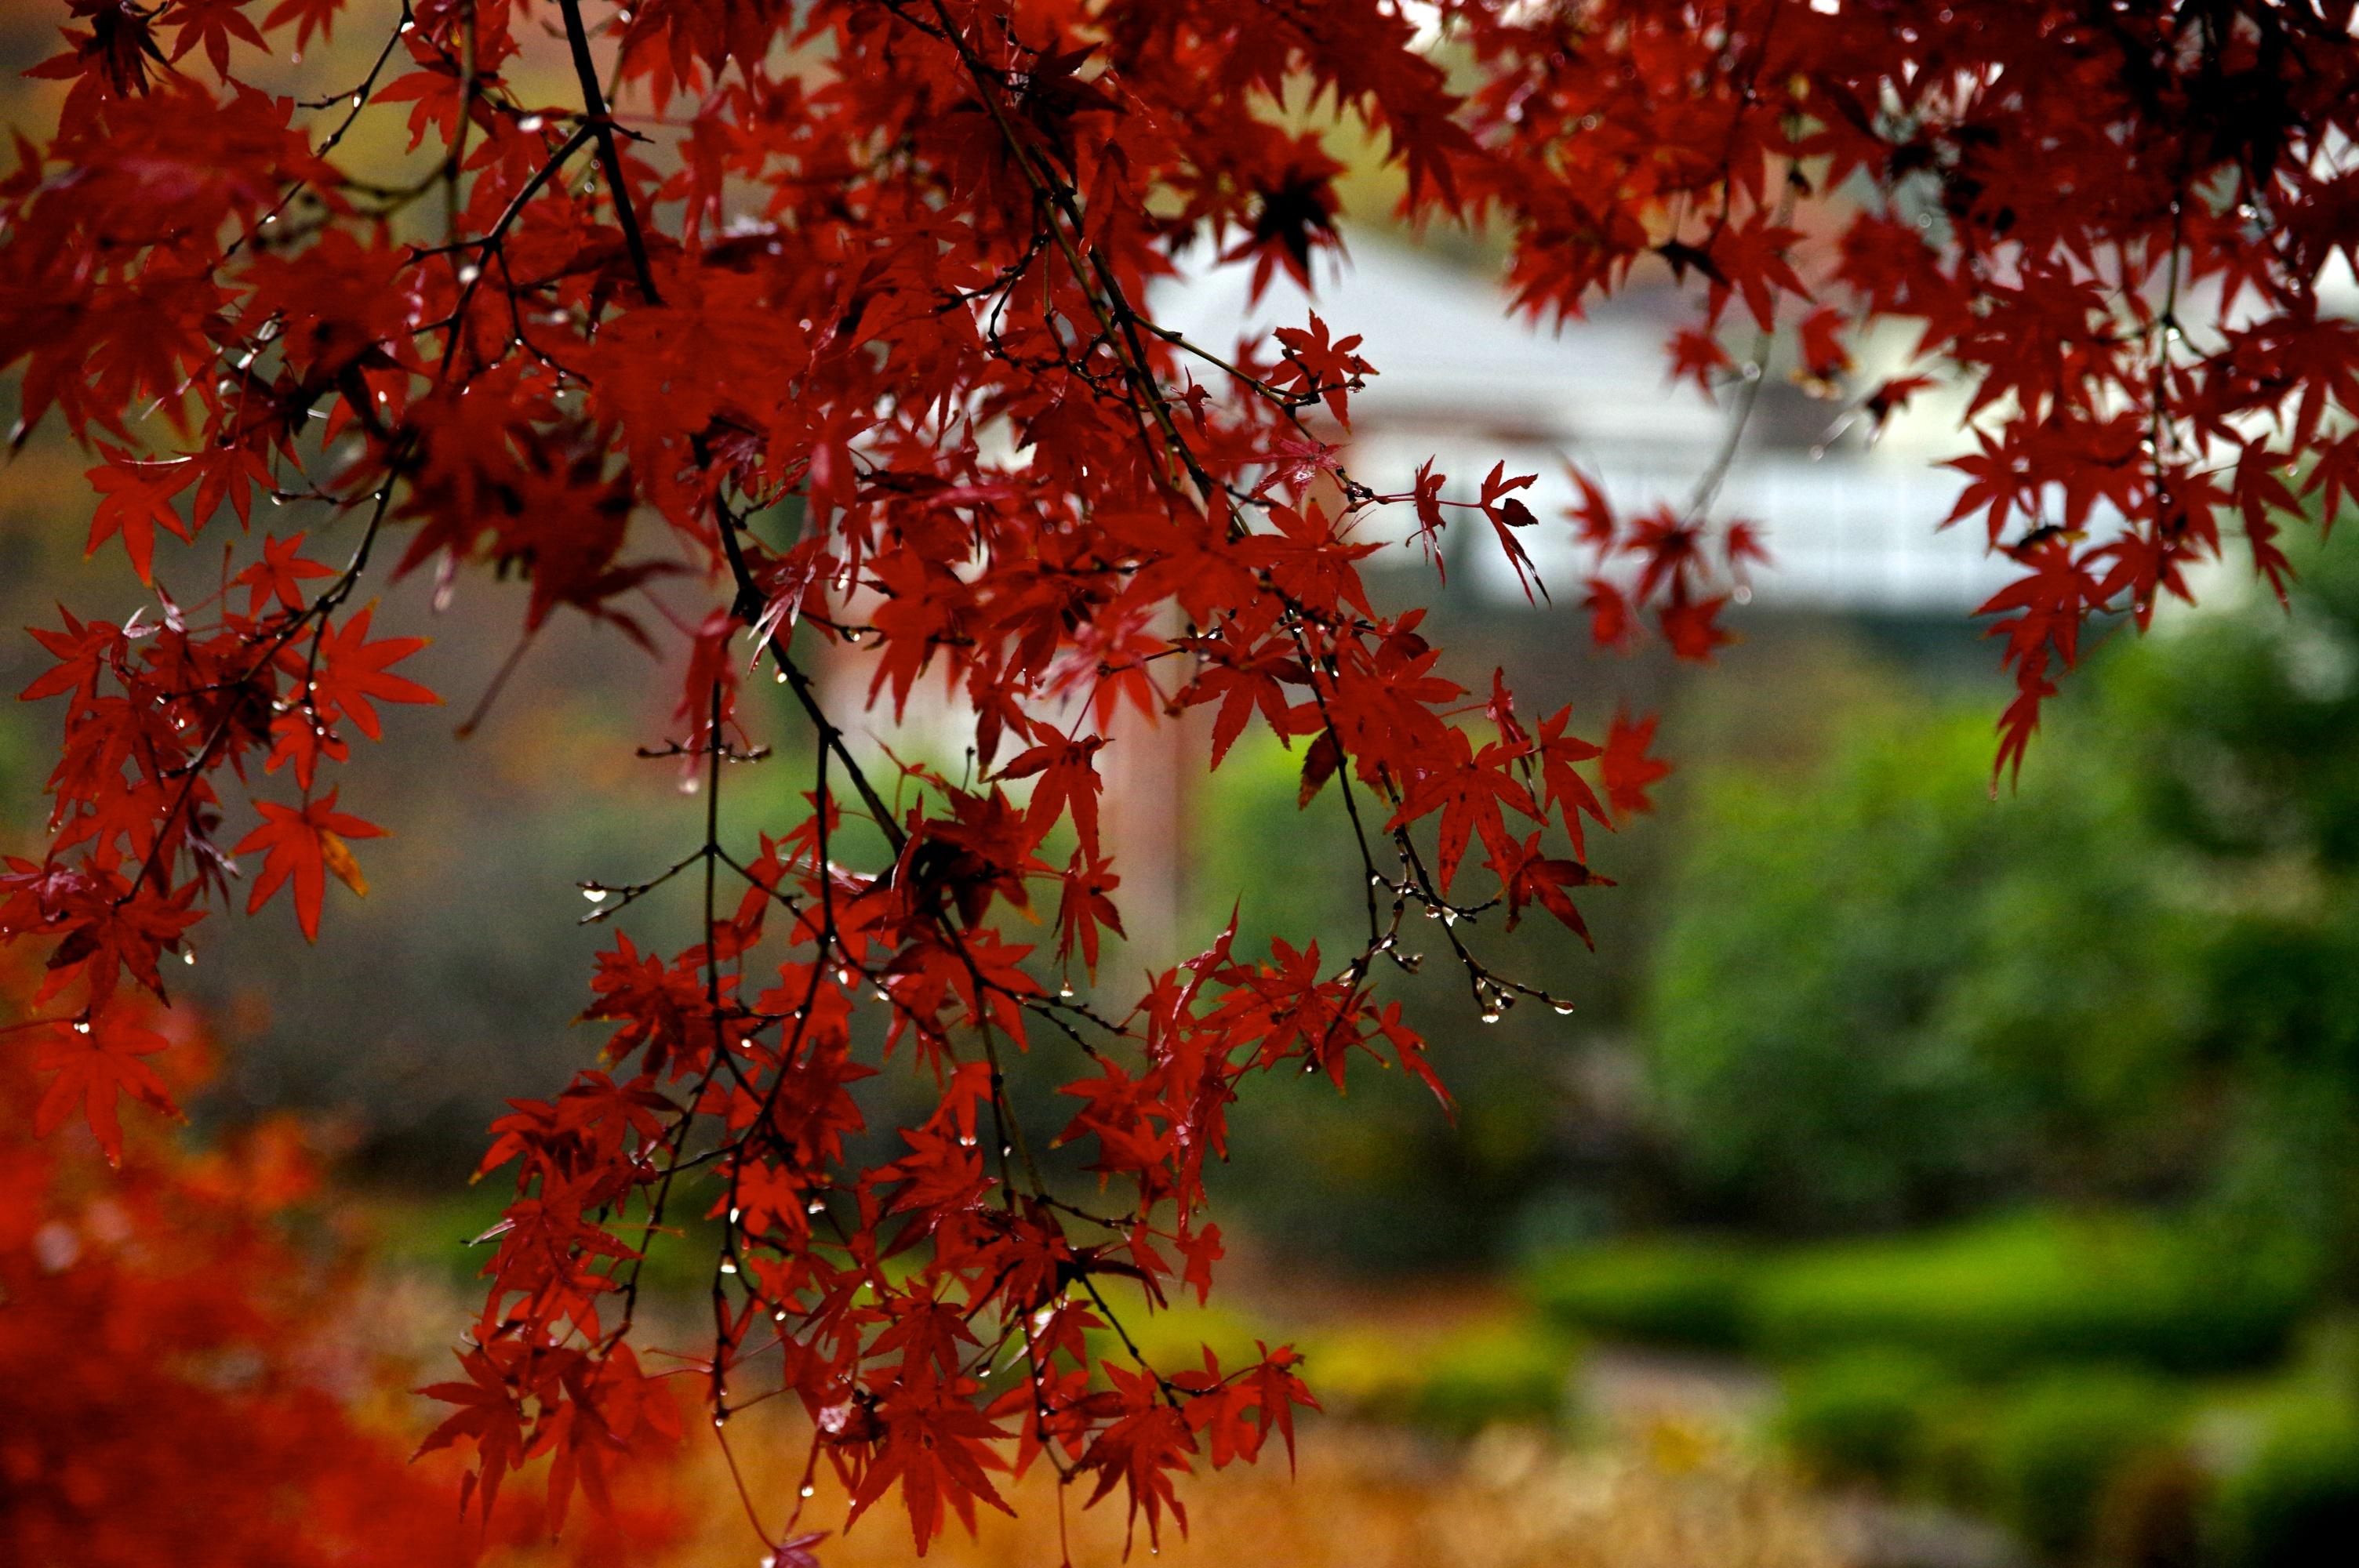 Autumn Fall Water Leaves Rain Leaf Autum Pentax Sigma Rainy Pentaxart